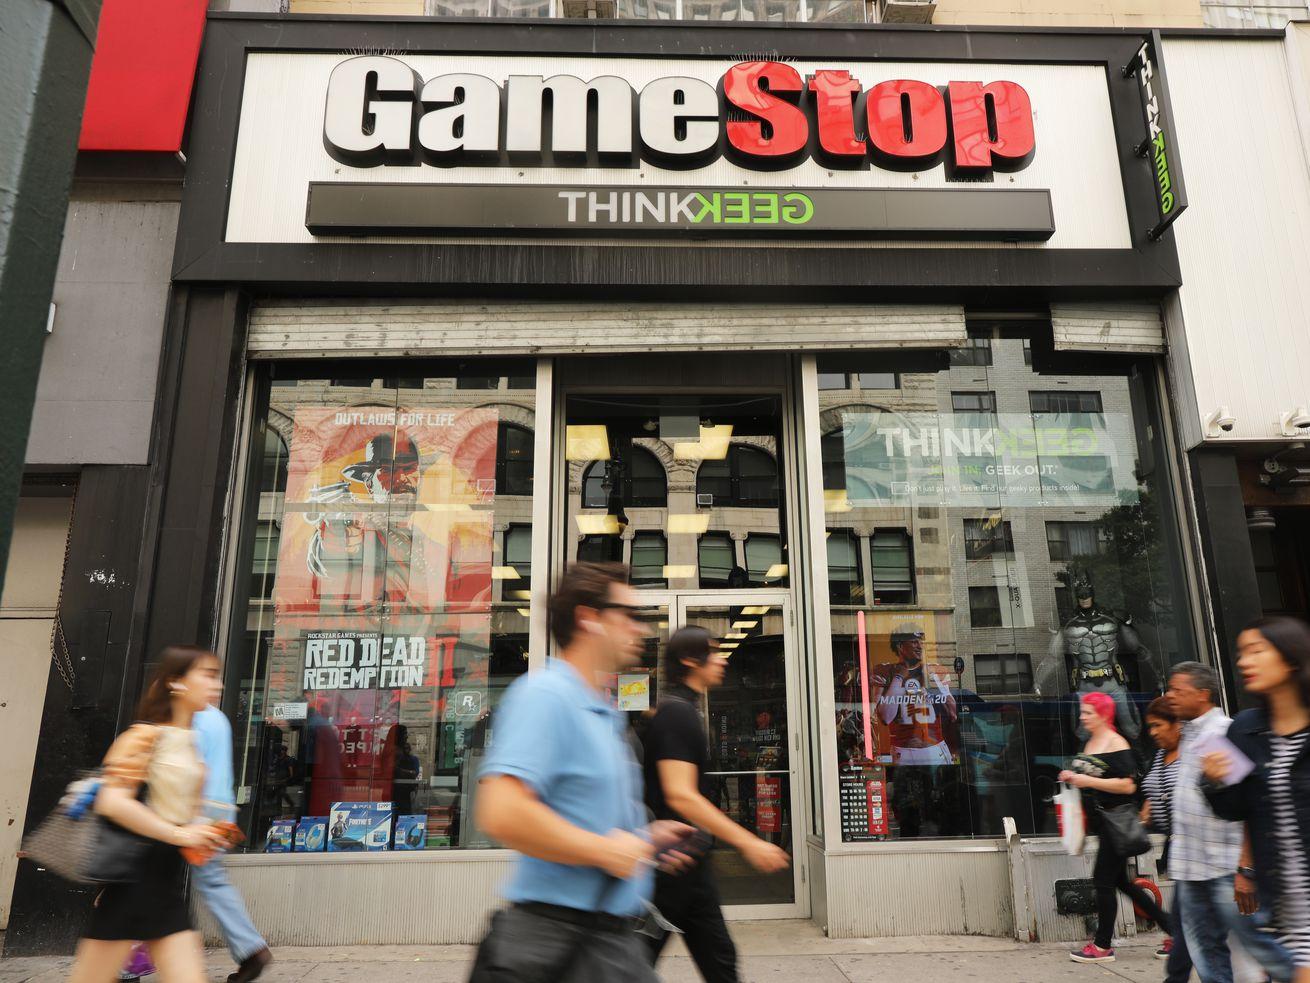 People walking by a GameStop.